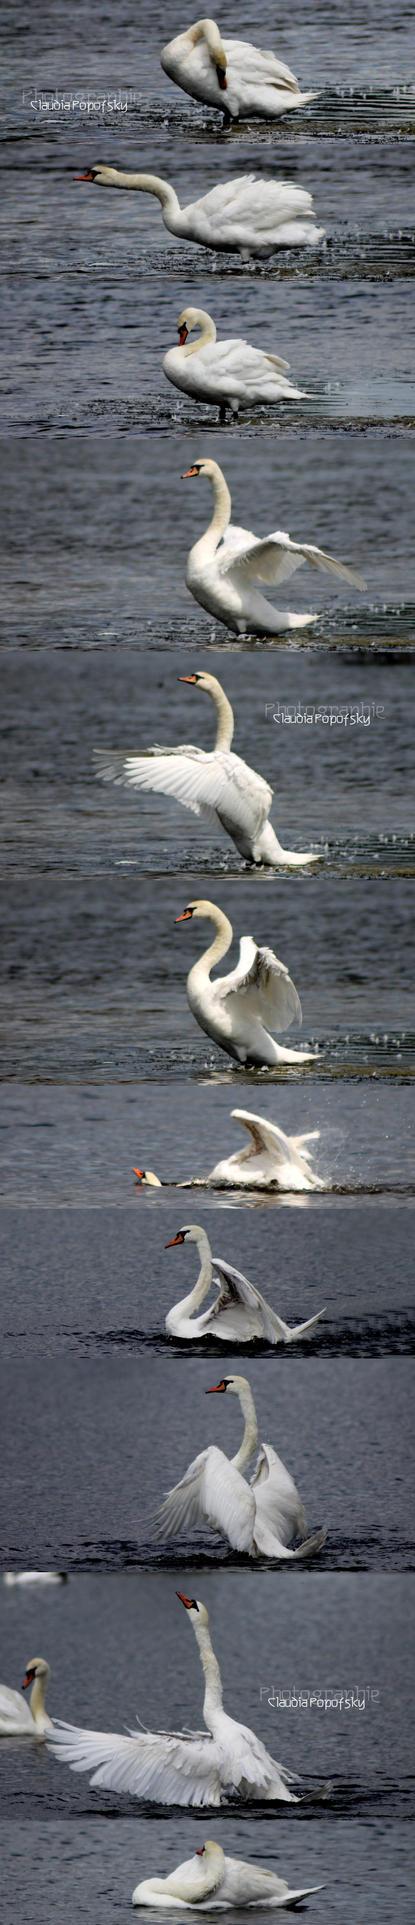 swan gymnastics by declaudi